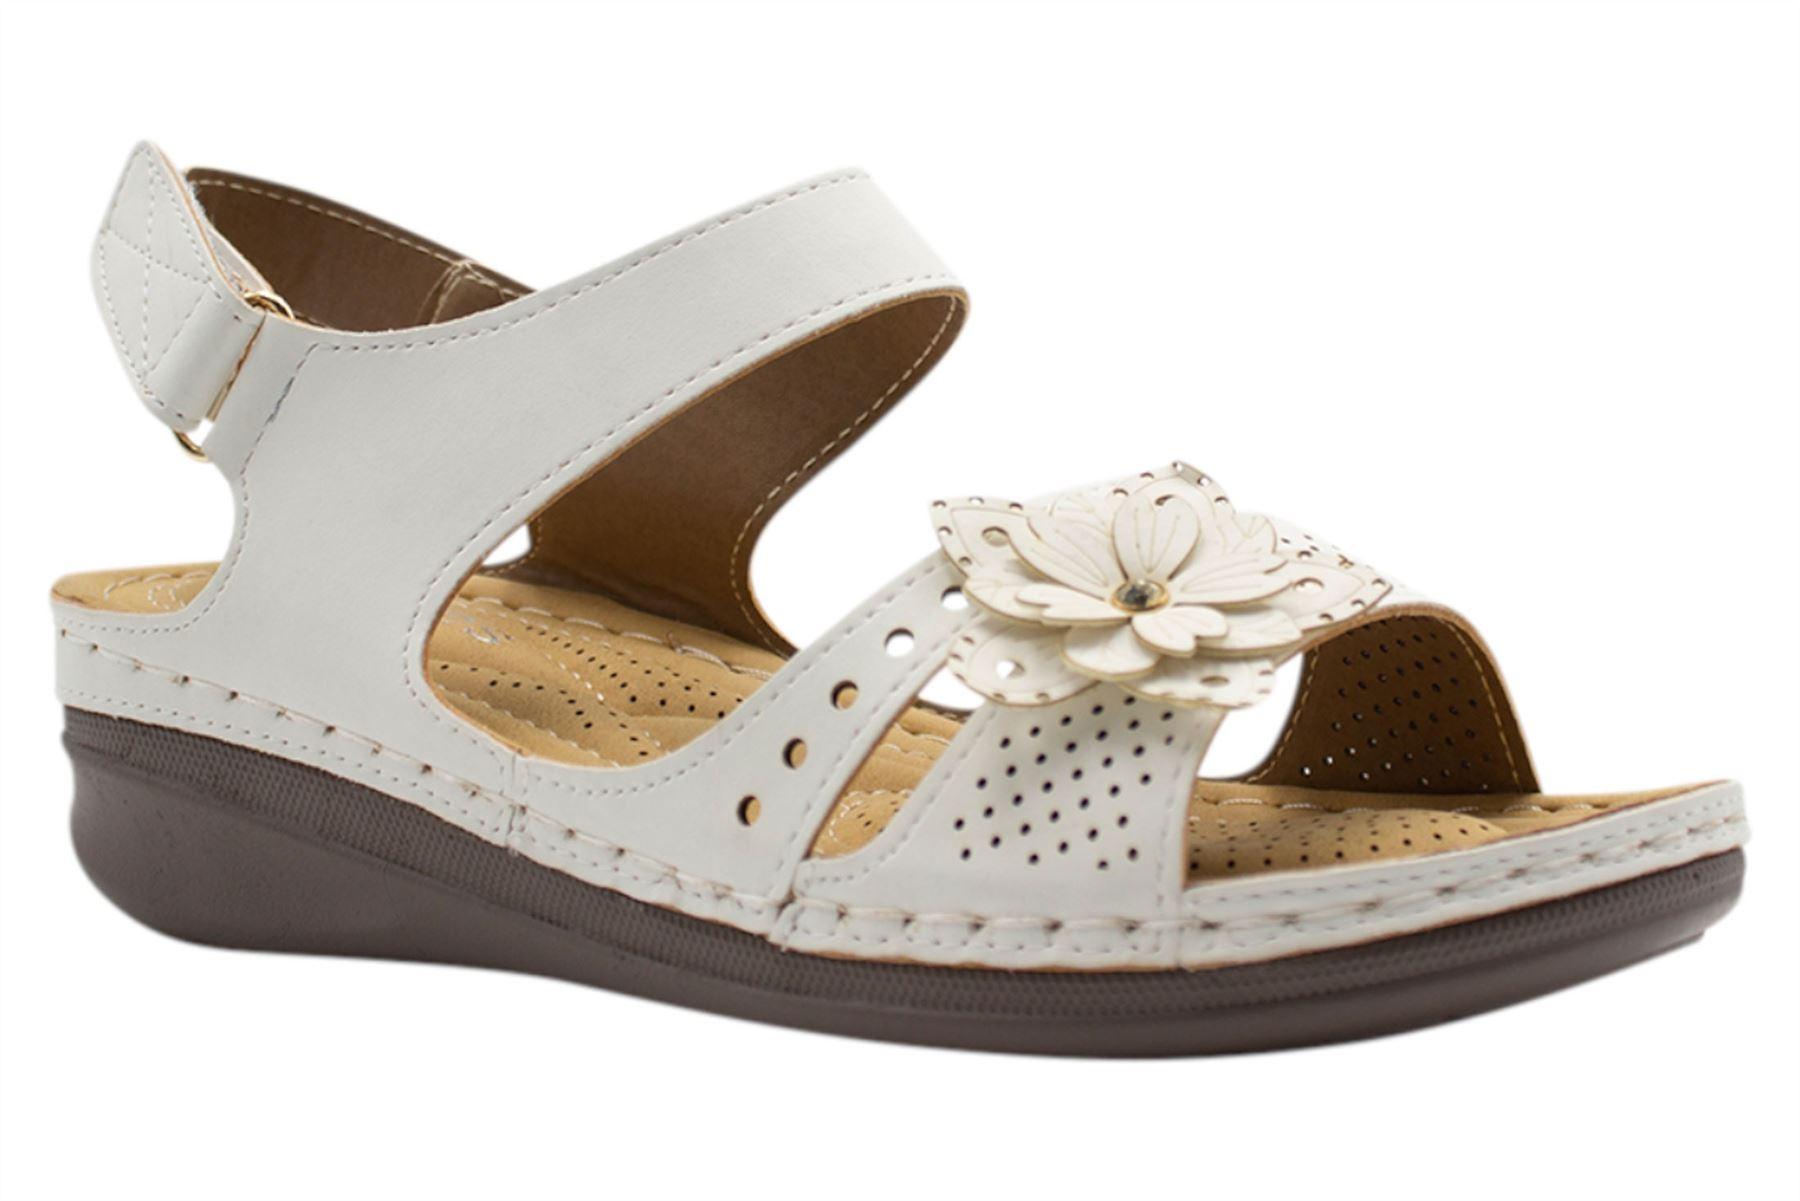 Ladies-Wedge-Heel-Sandal-Womens-Comfort-Cushion-Strapy-Summer-Shoes miniatura 40